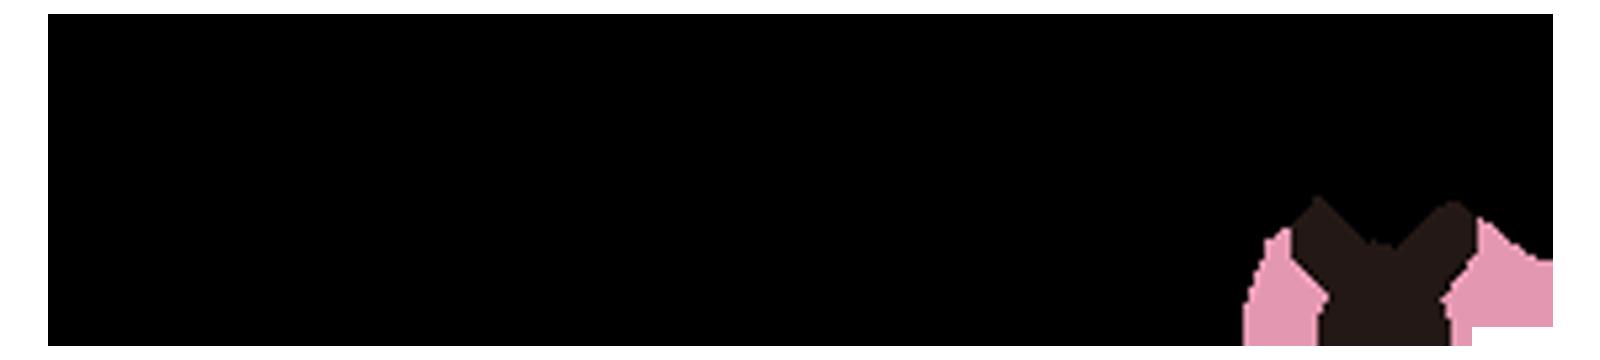 MONOKIPPA モノづくりキッズパーク(モノキッパ)